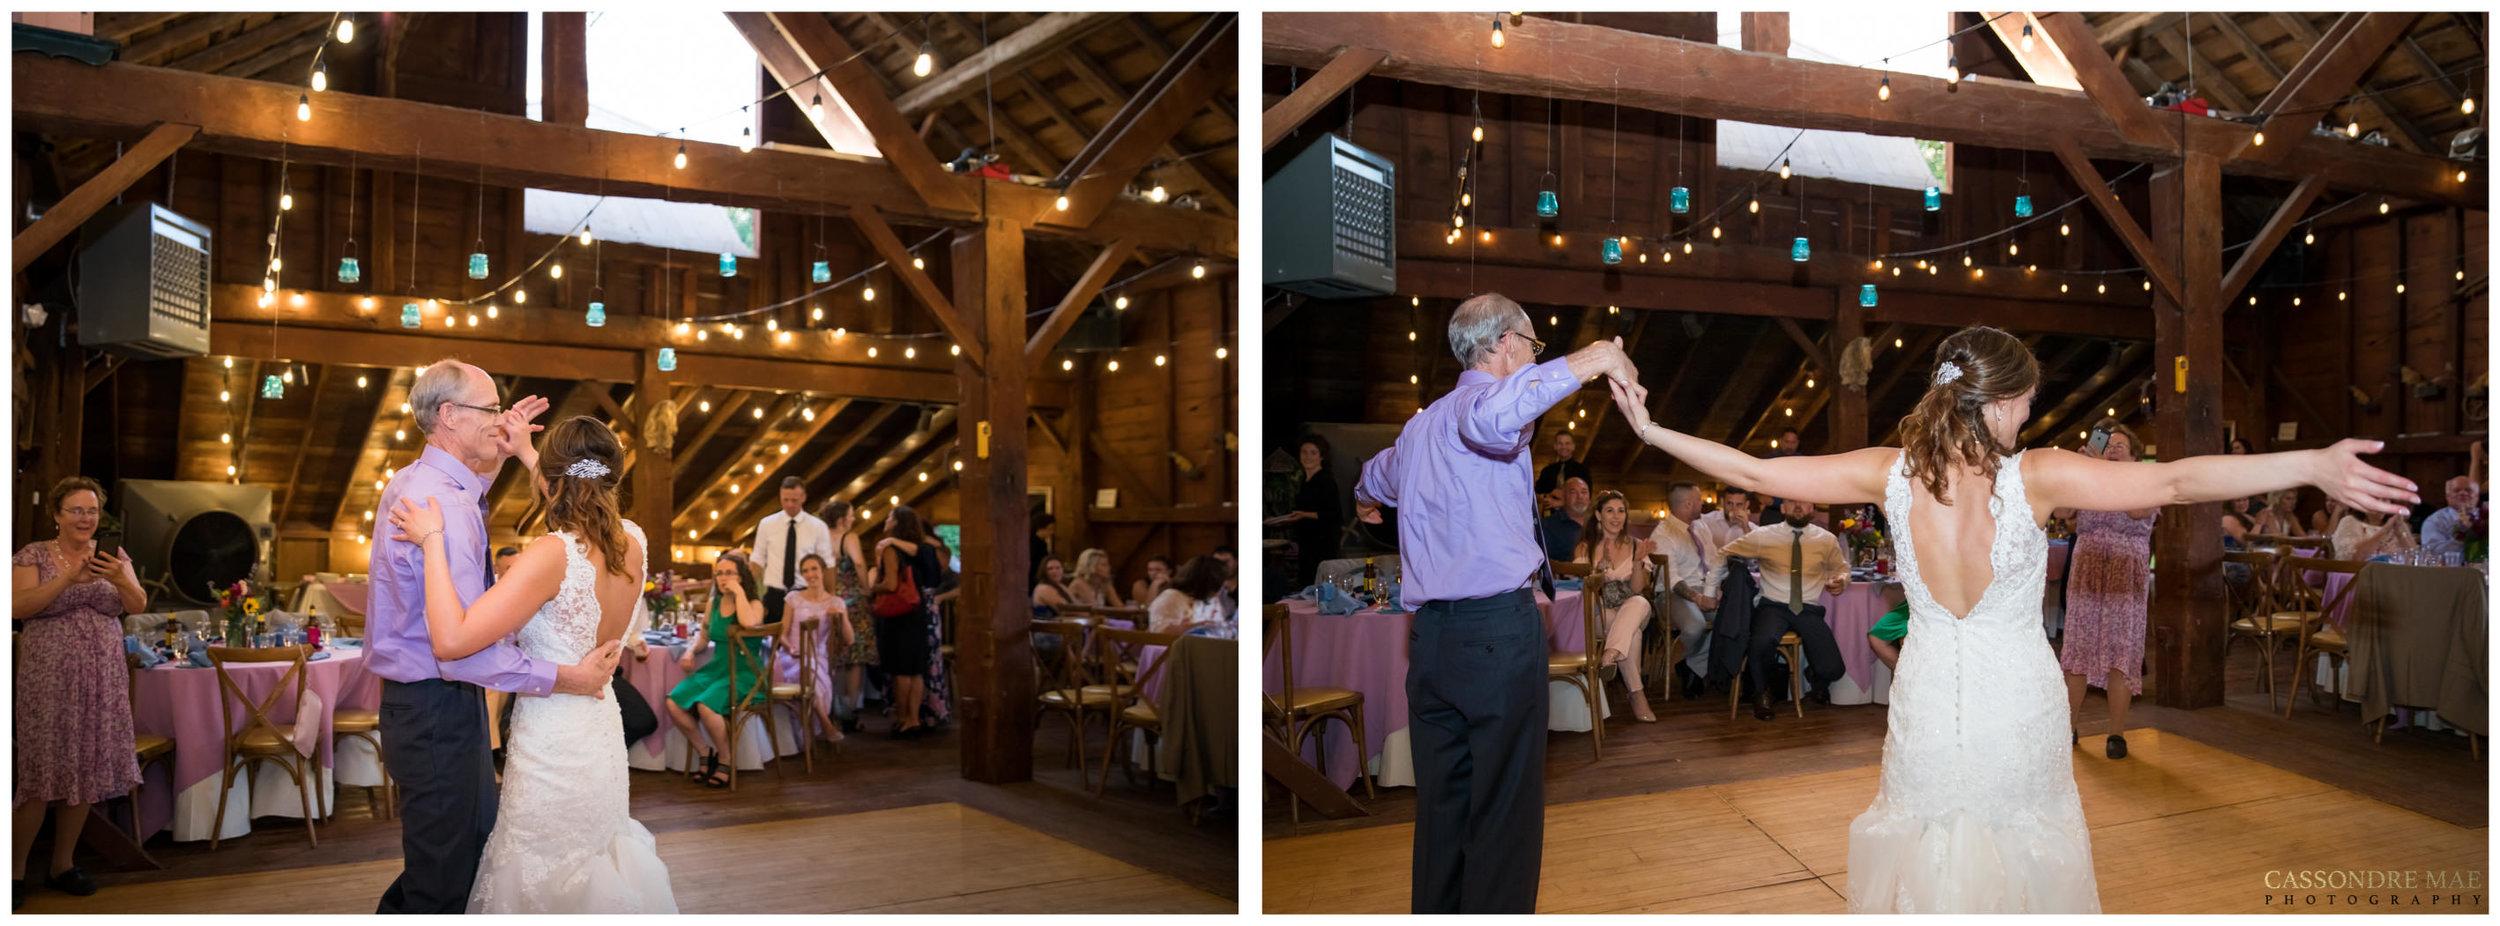 Cassondre Mae Photography hudson valley barn weddings -19.jpg